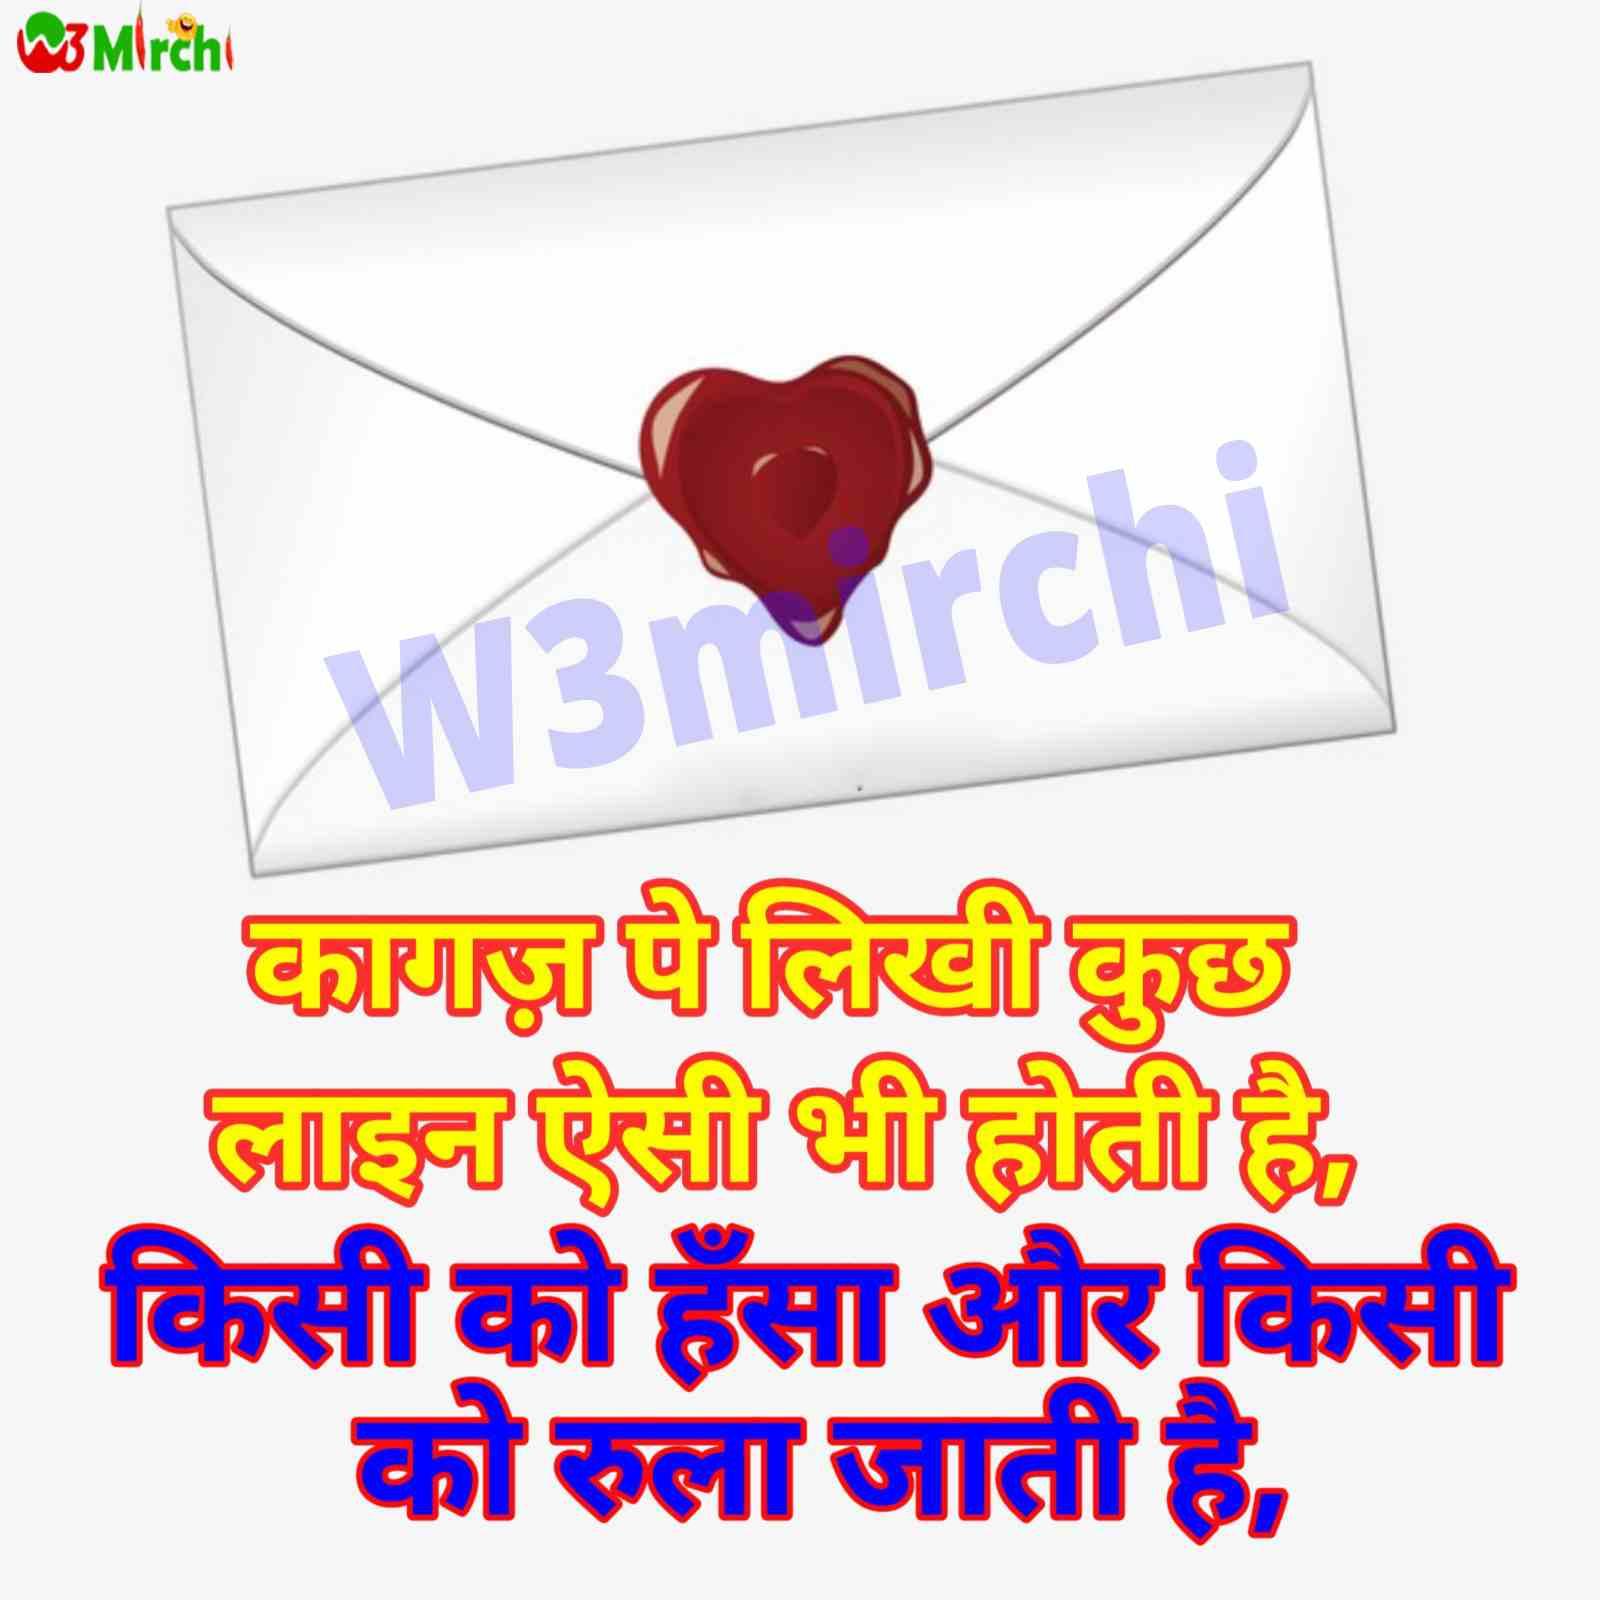 Kagaz Shayari       कागज़ पे लिखी कुछ